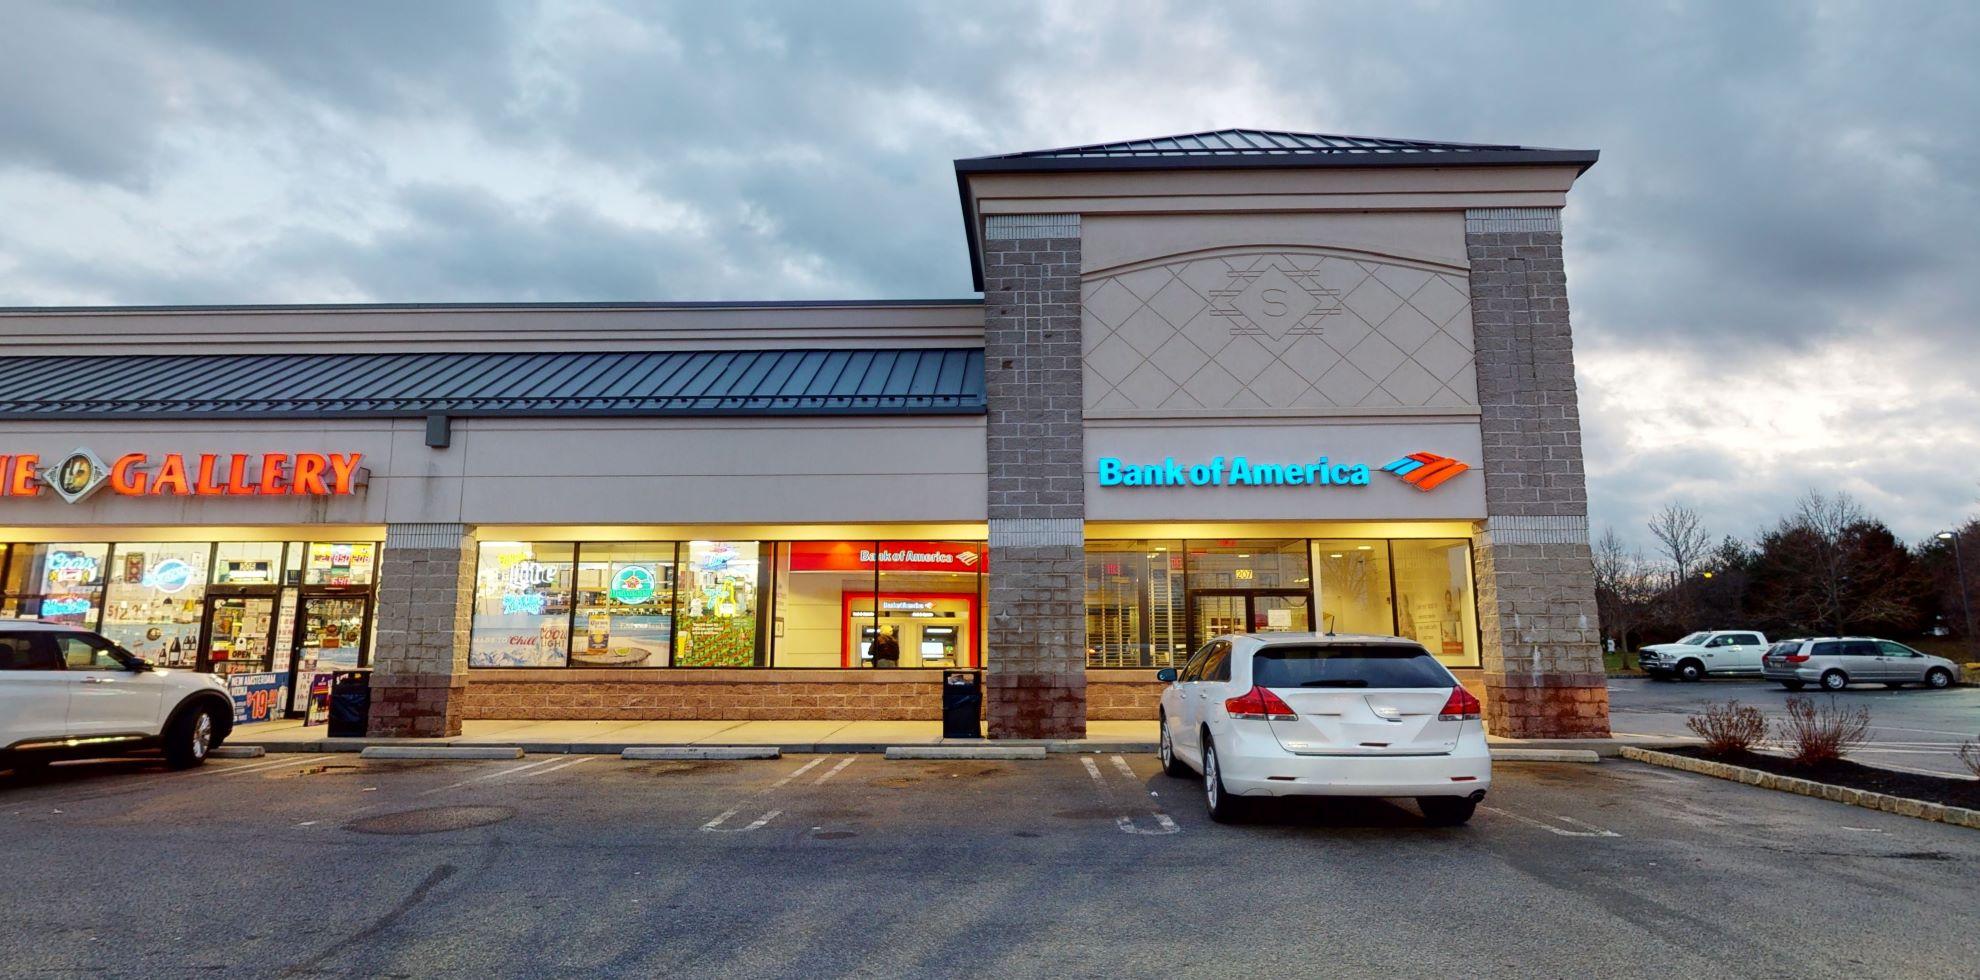 Bank of America financial center with walk-up ATM | 24 Summerfield Blvd, Dayton, NJ 08810